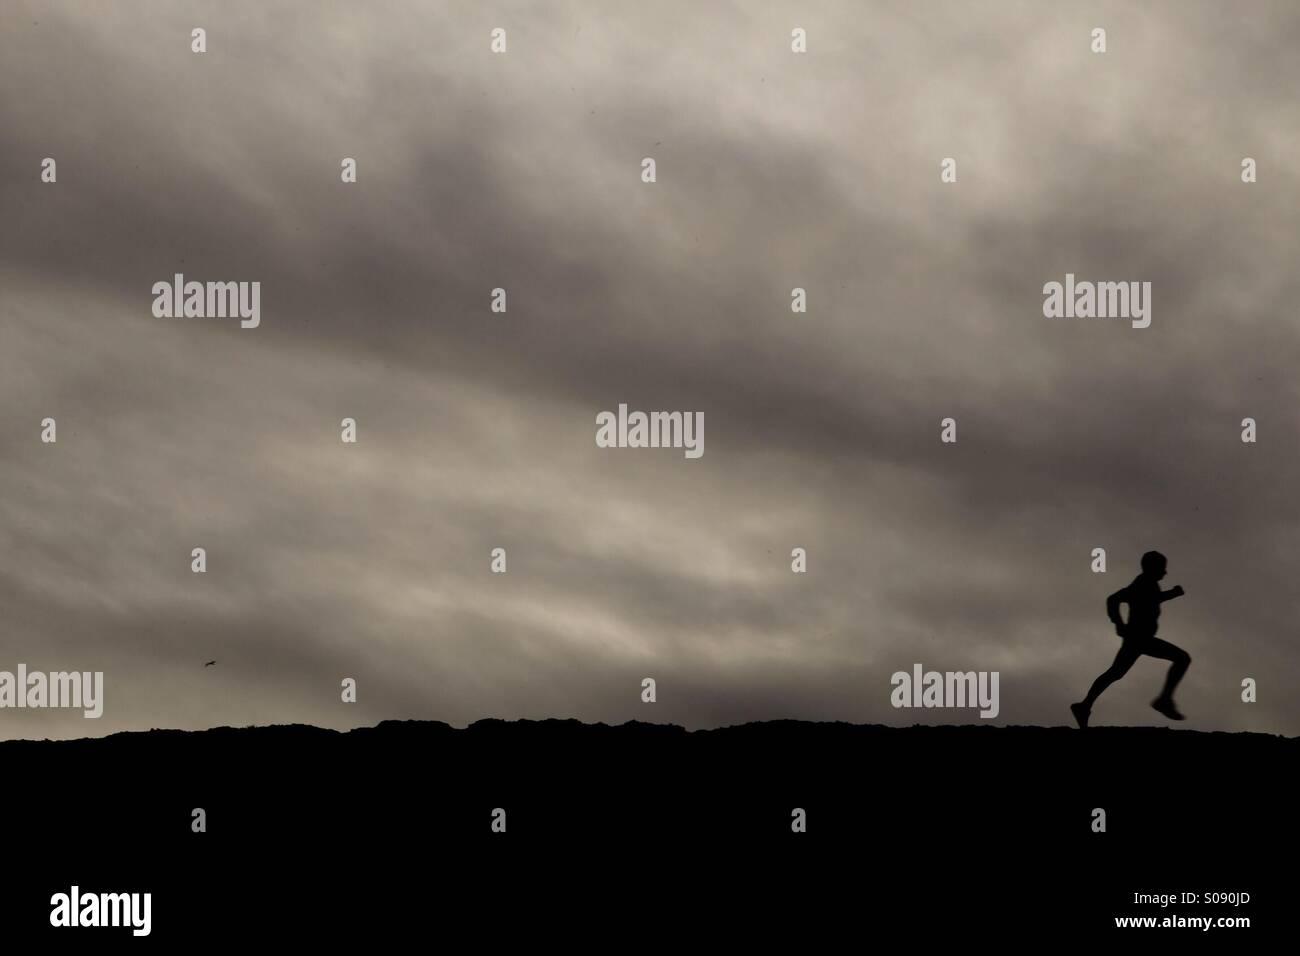 Running man 3 - Stock Image